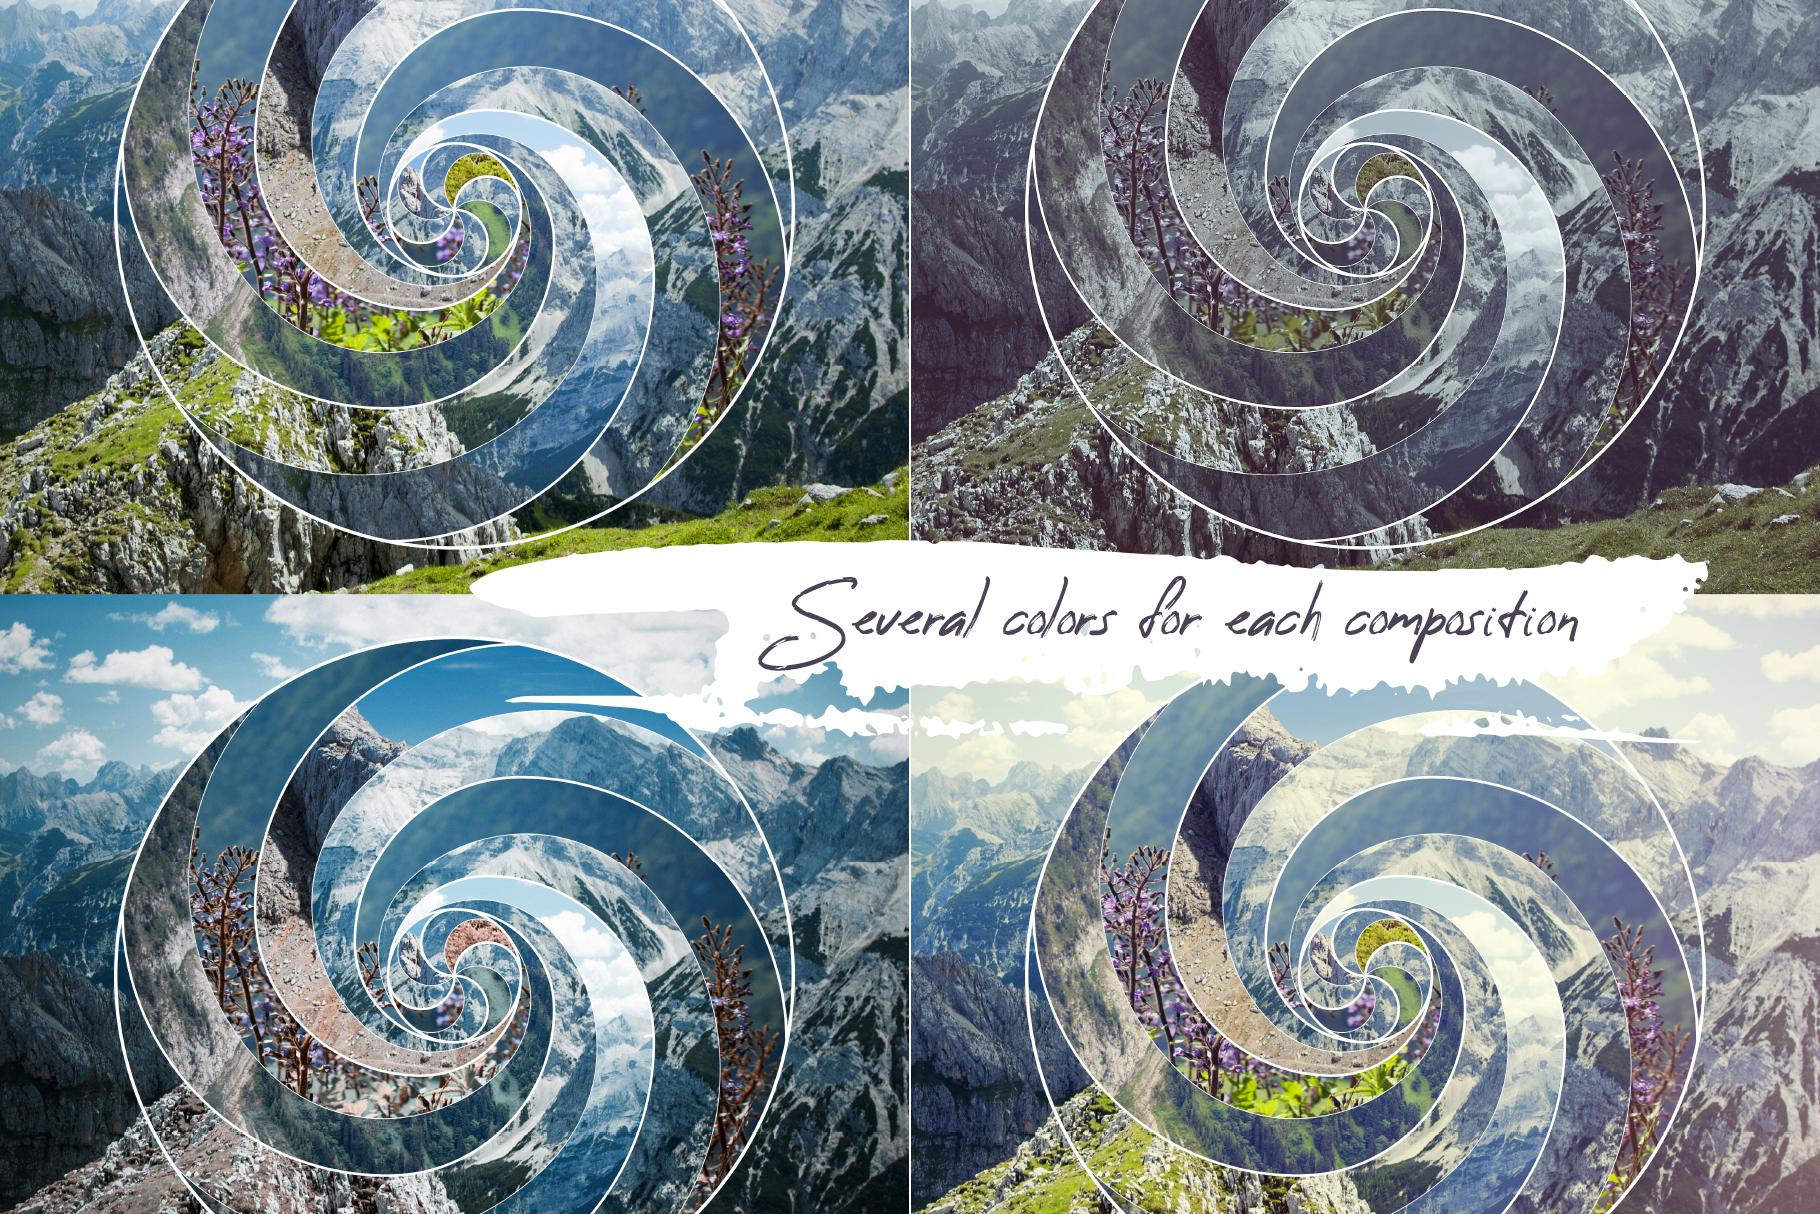 Sacred geometry unity of nature example image 2